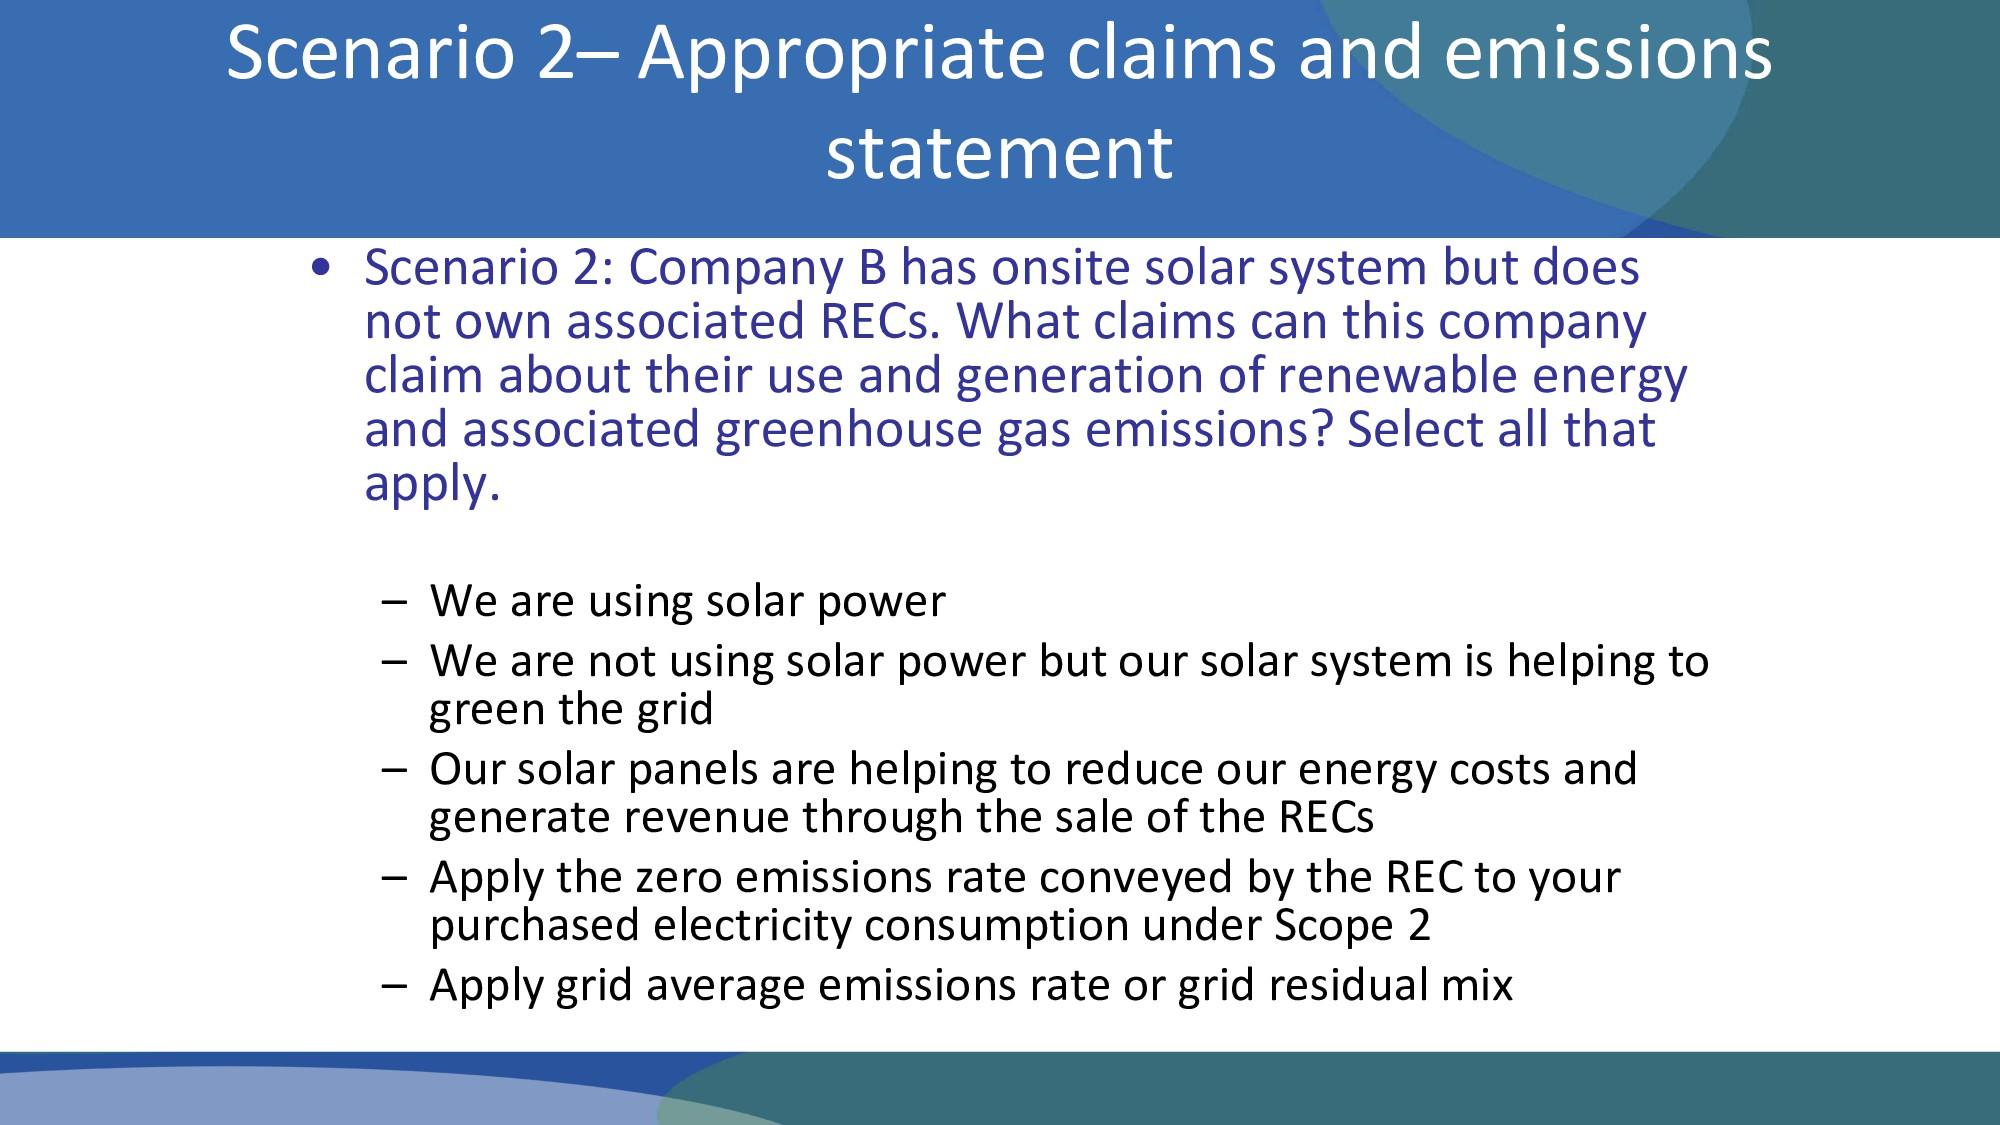 • Scenario 2: Company B has onsite solar system...